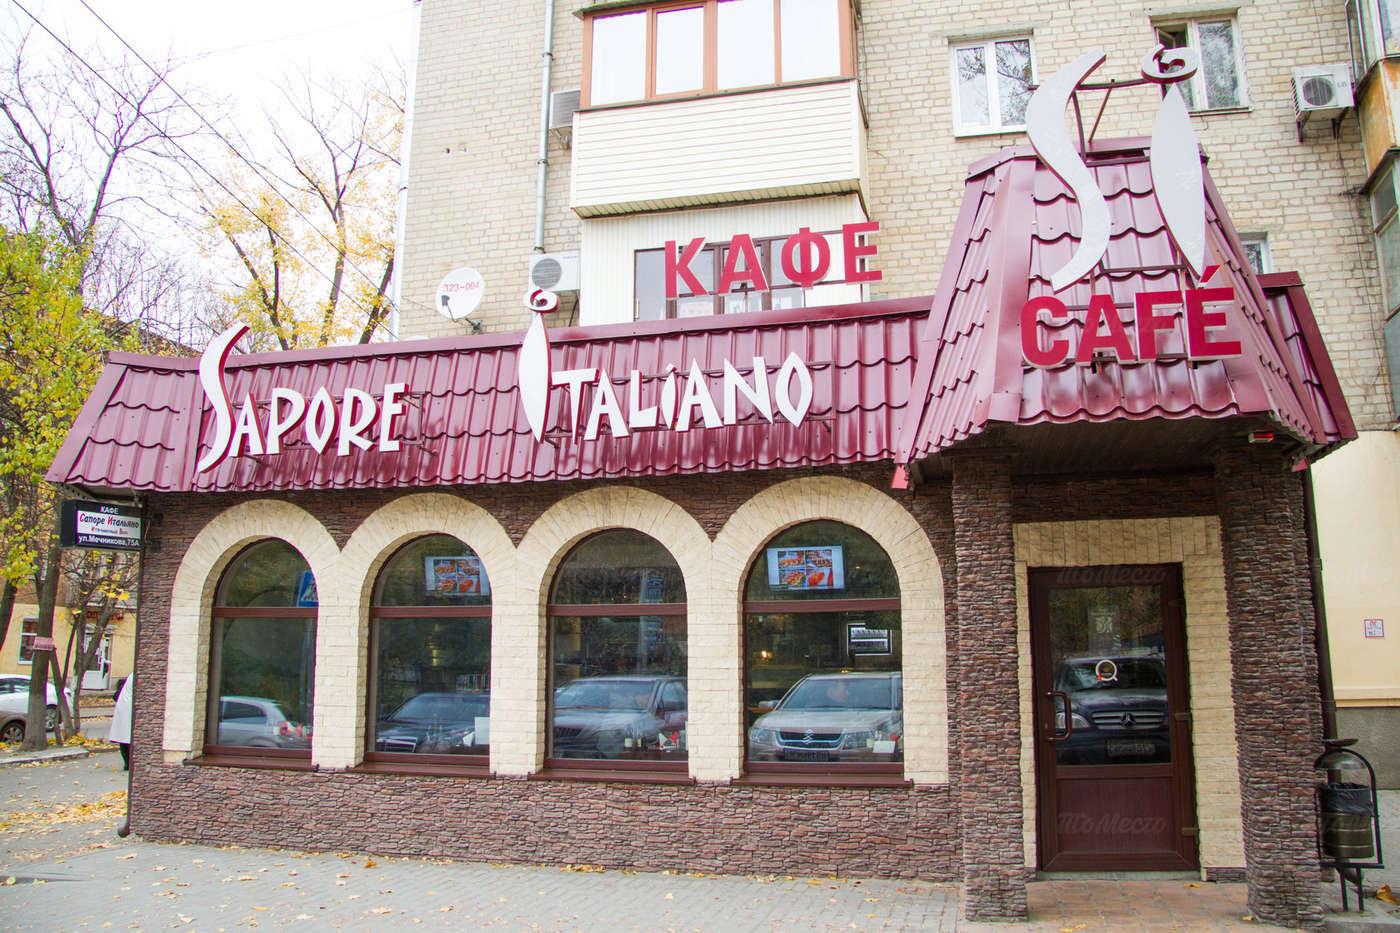 Кафе Sapore italiano на Мечникова фото 4